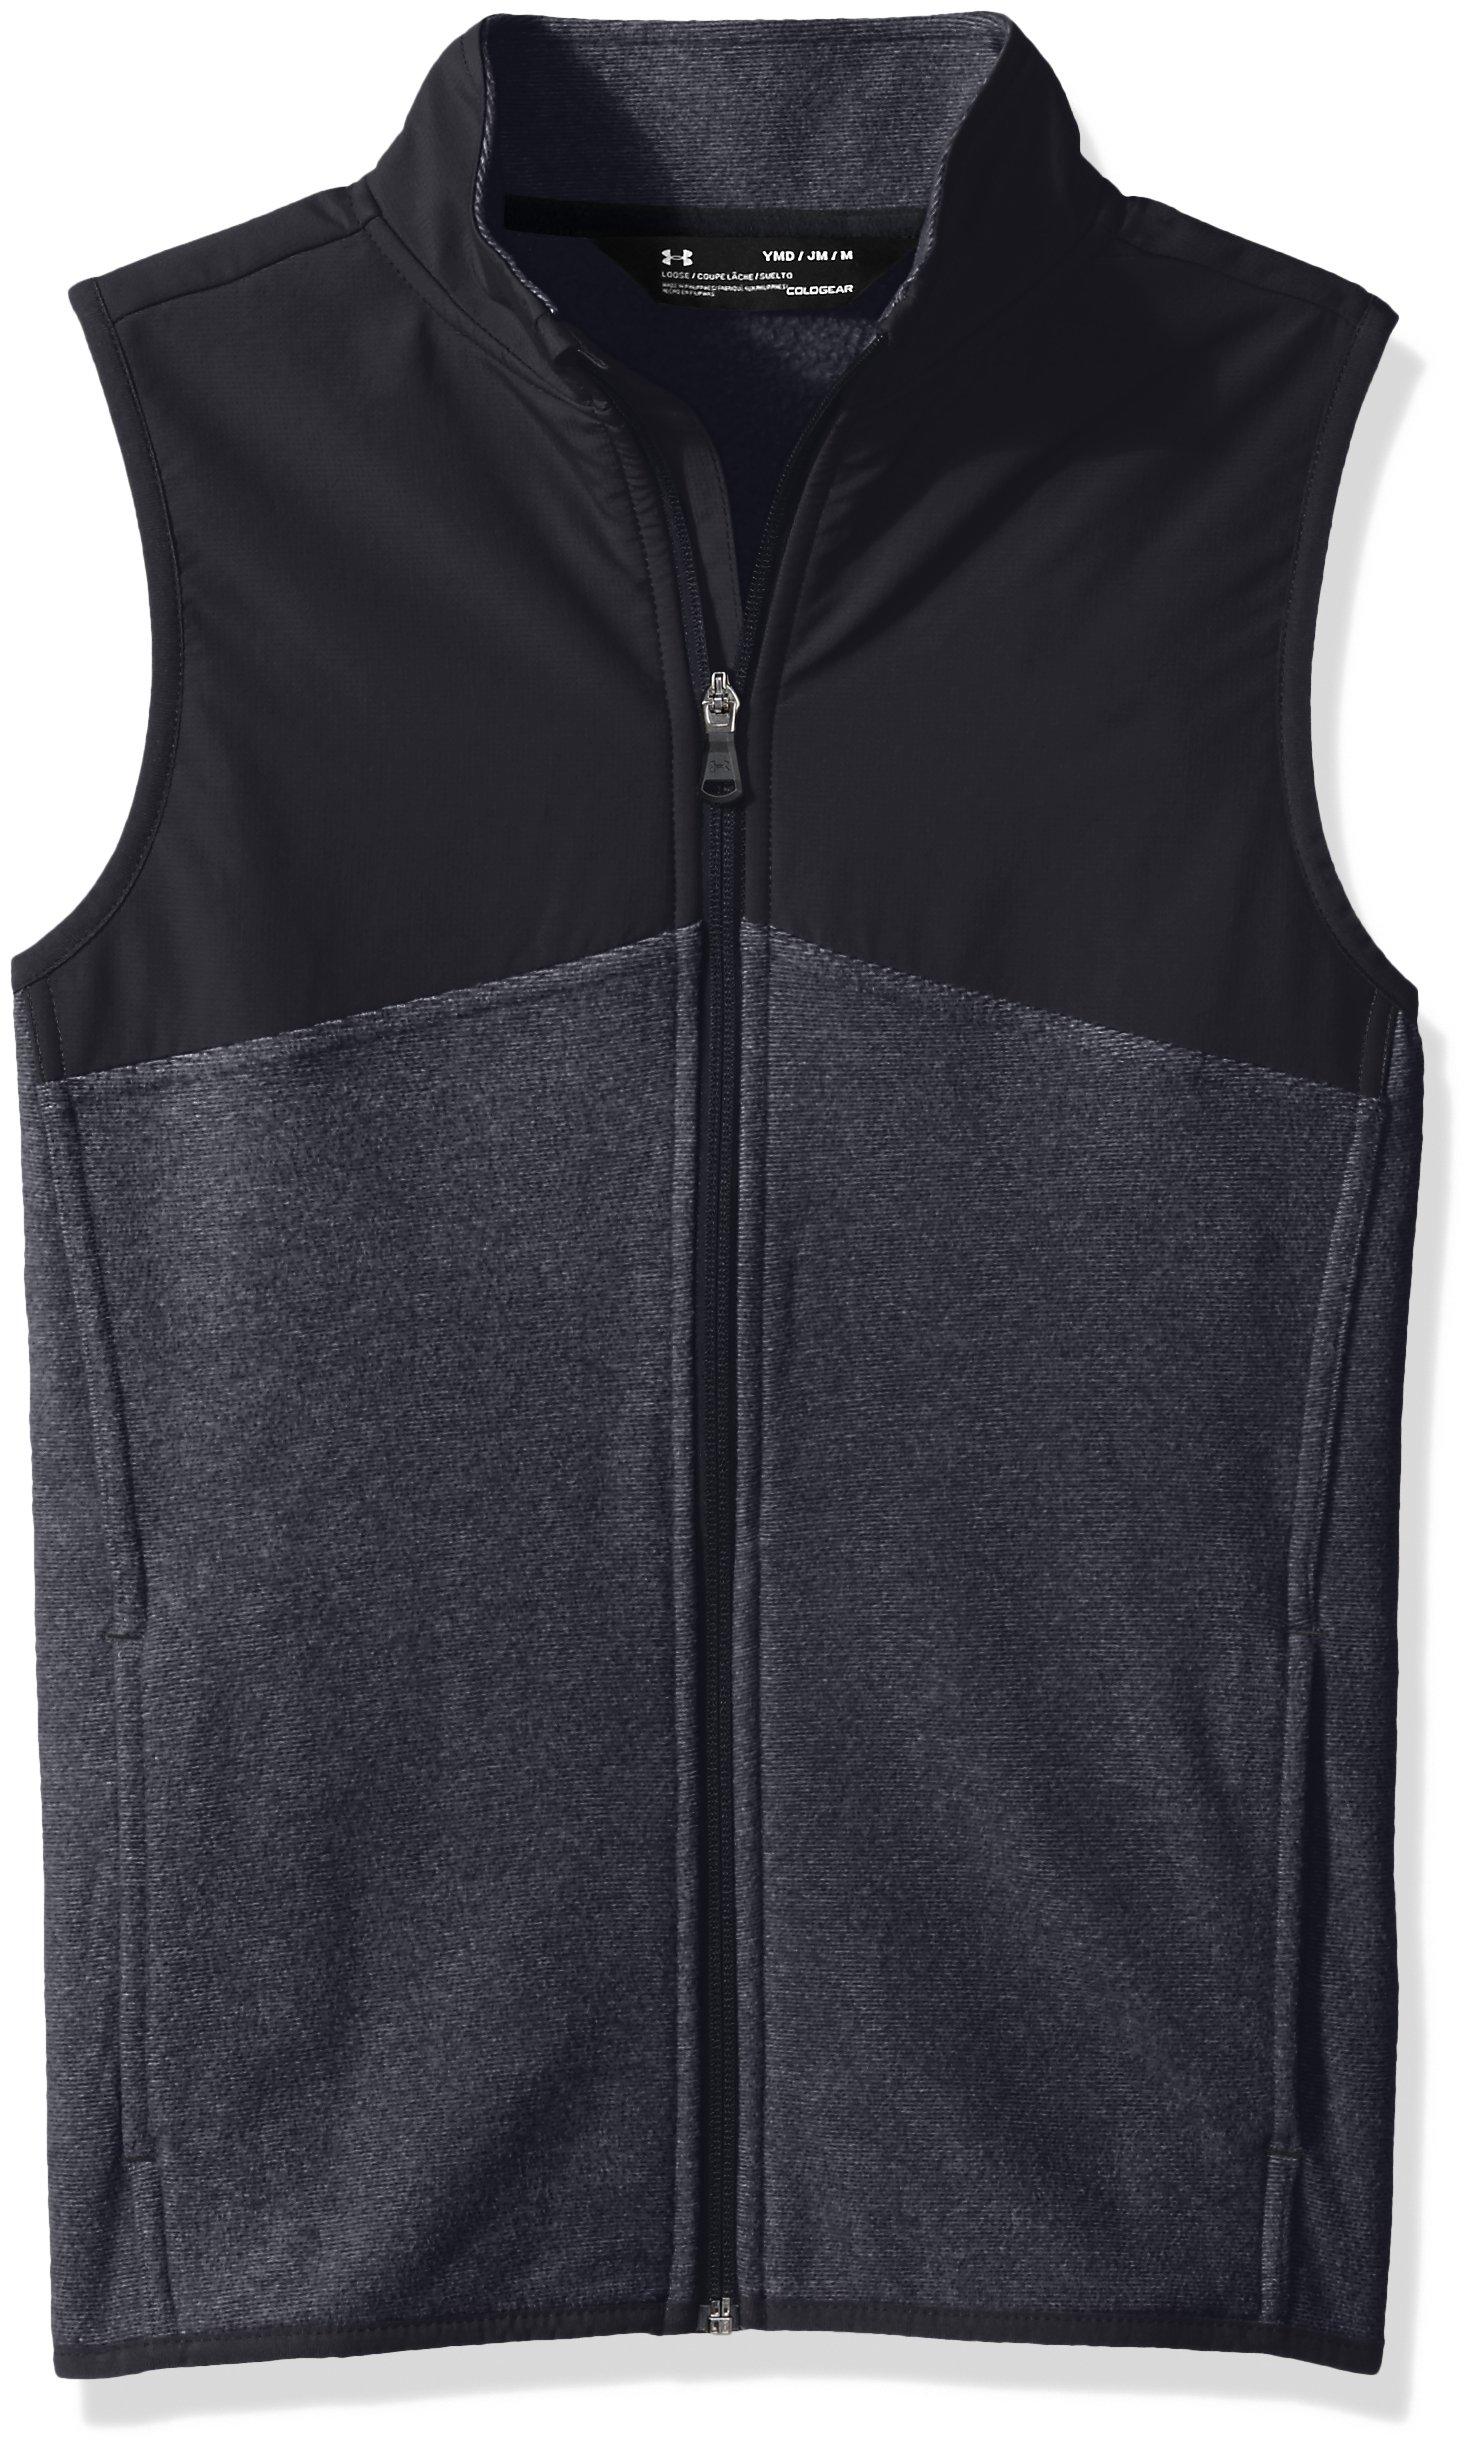 Under Armour Boys' Phenom Vest,Black (001)/Black, Youth X-Large